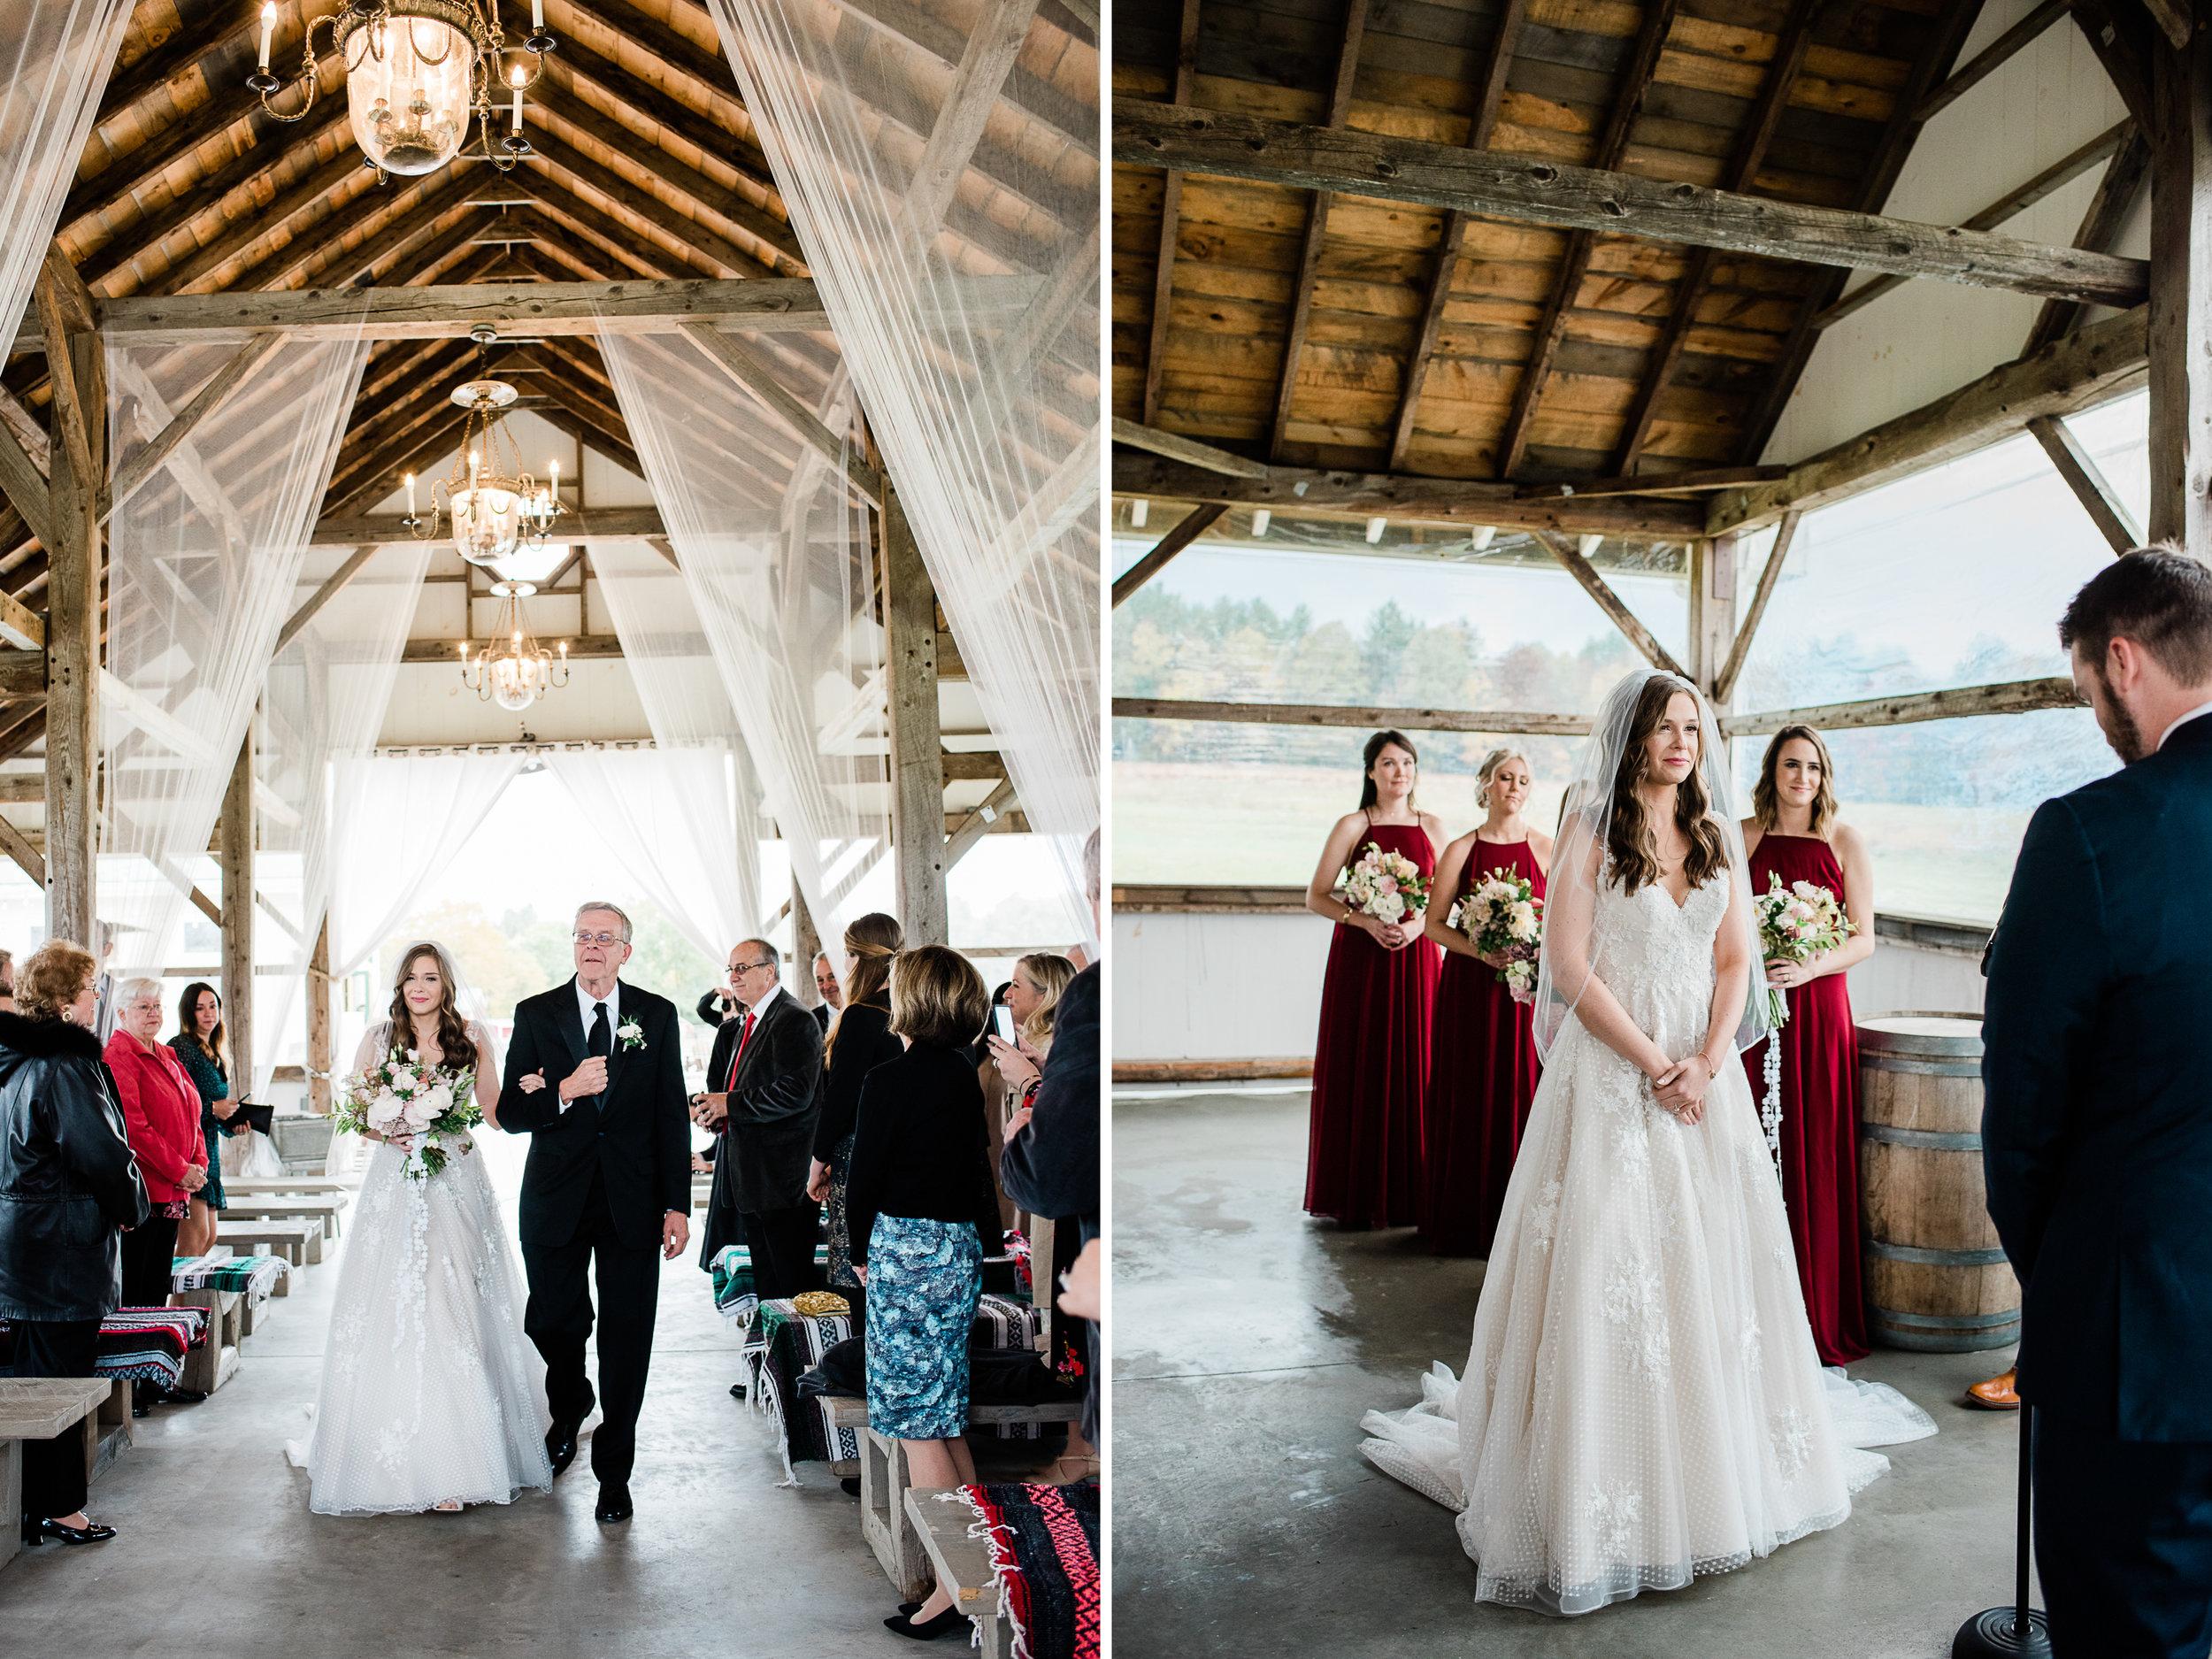 Wedding Photography in the Catskills